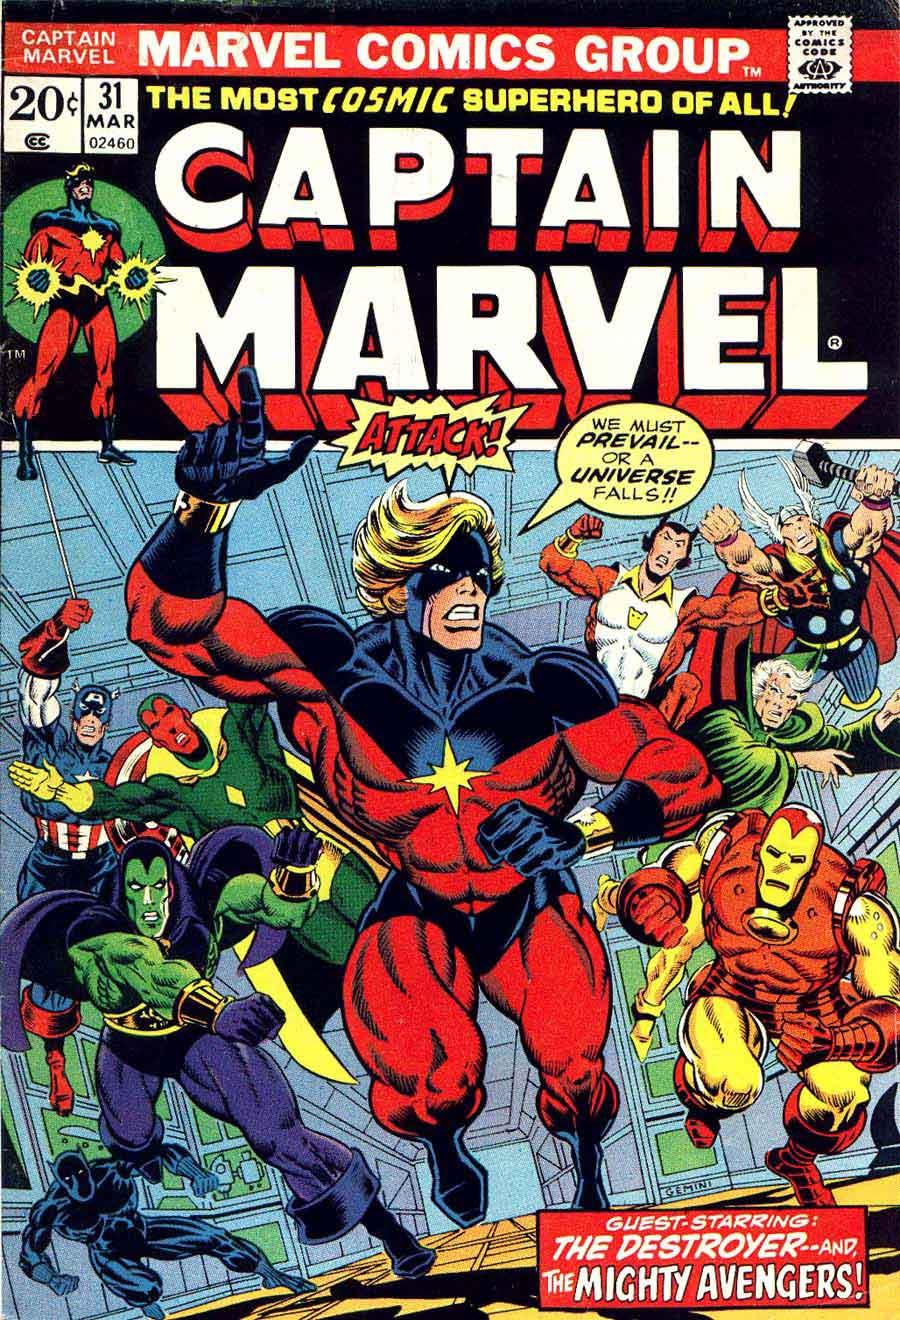 Marvel Comic Book Cover Art : Captain marvel v jim starlin art cover top